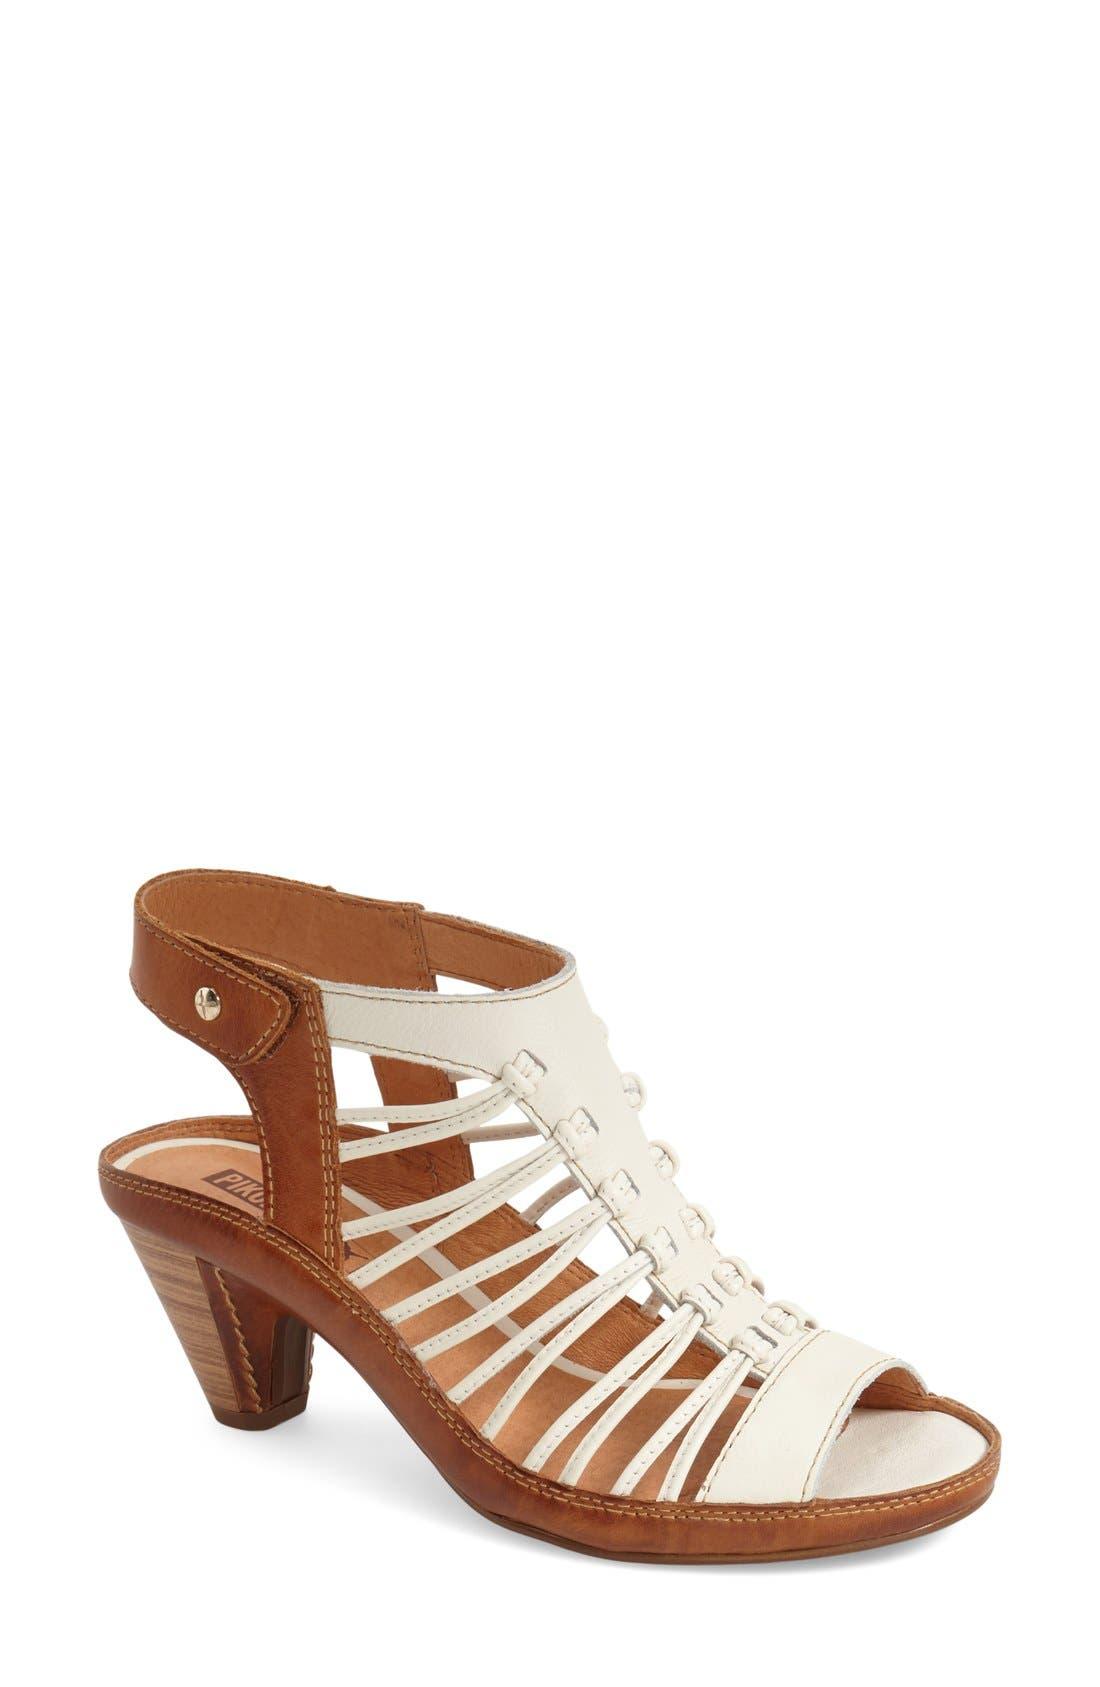 Alternate Image 1 Selected - PIKOLINOS 'Java' Sandal (Women)